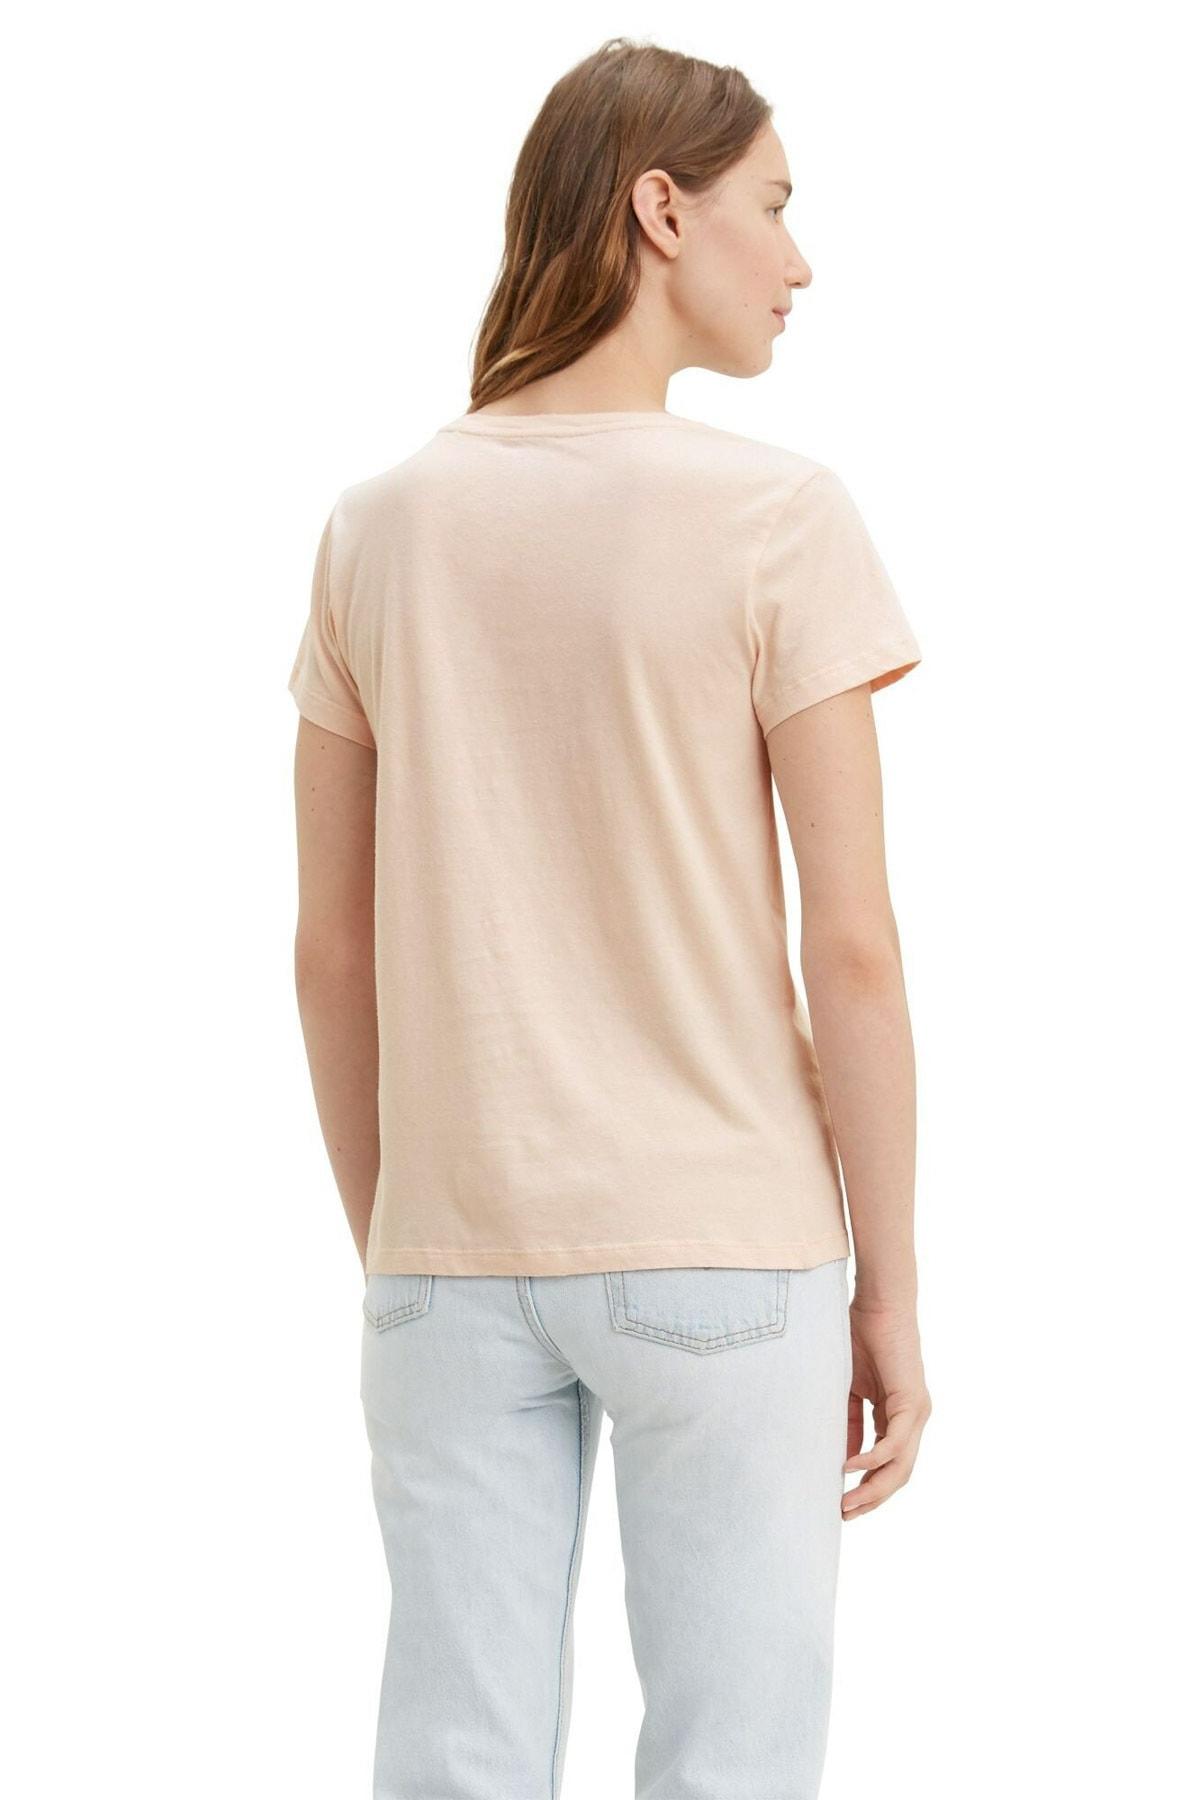 Levi's Kadın Pembe The Perfect T-shirt 17369-0832 2